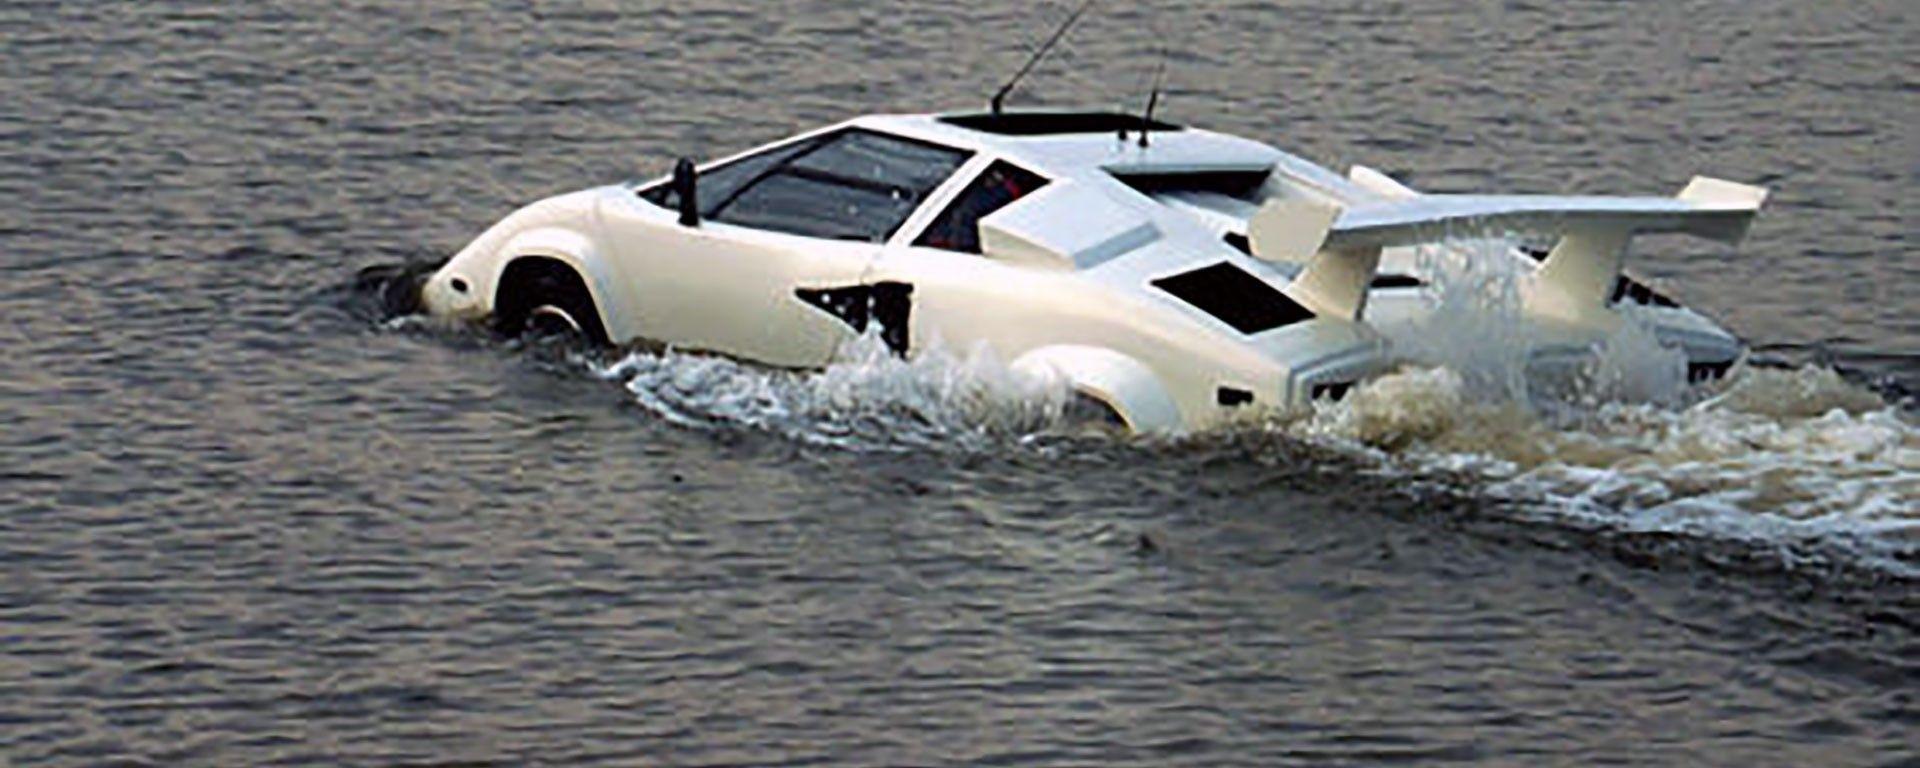 La Countach anfibia di Top Gear è in vendita su eBay!